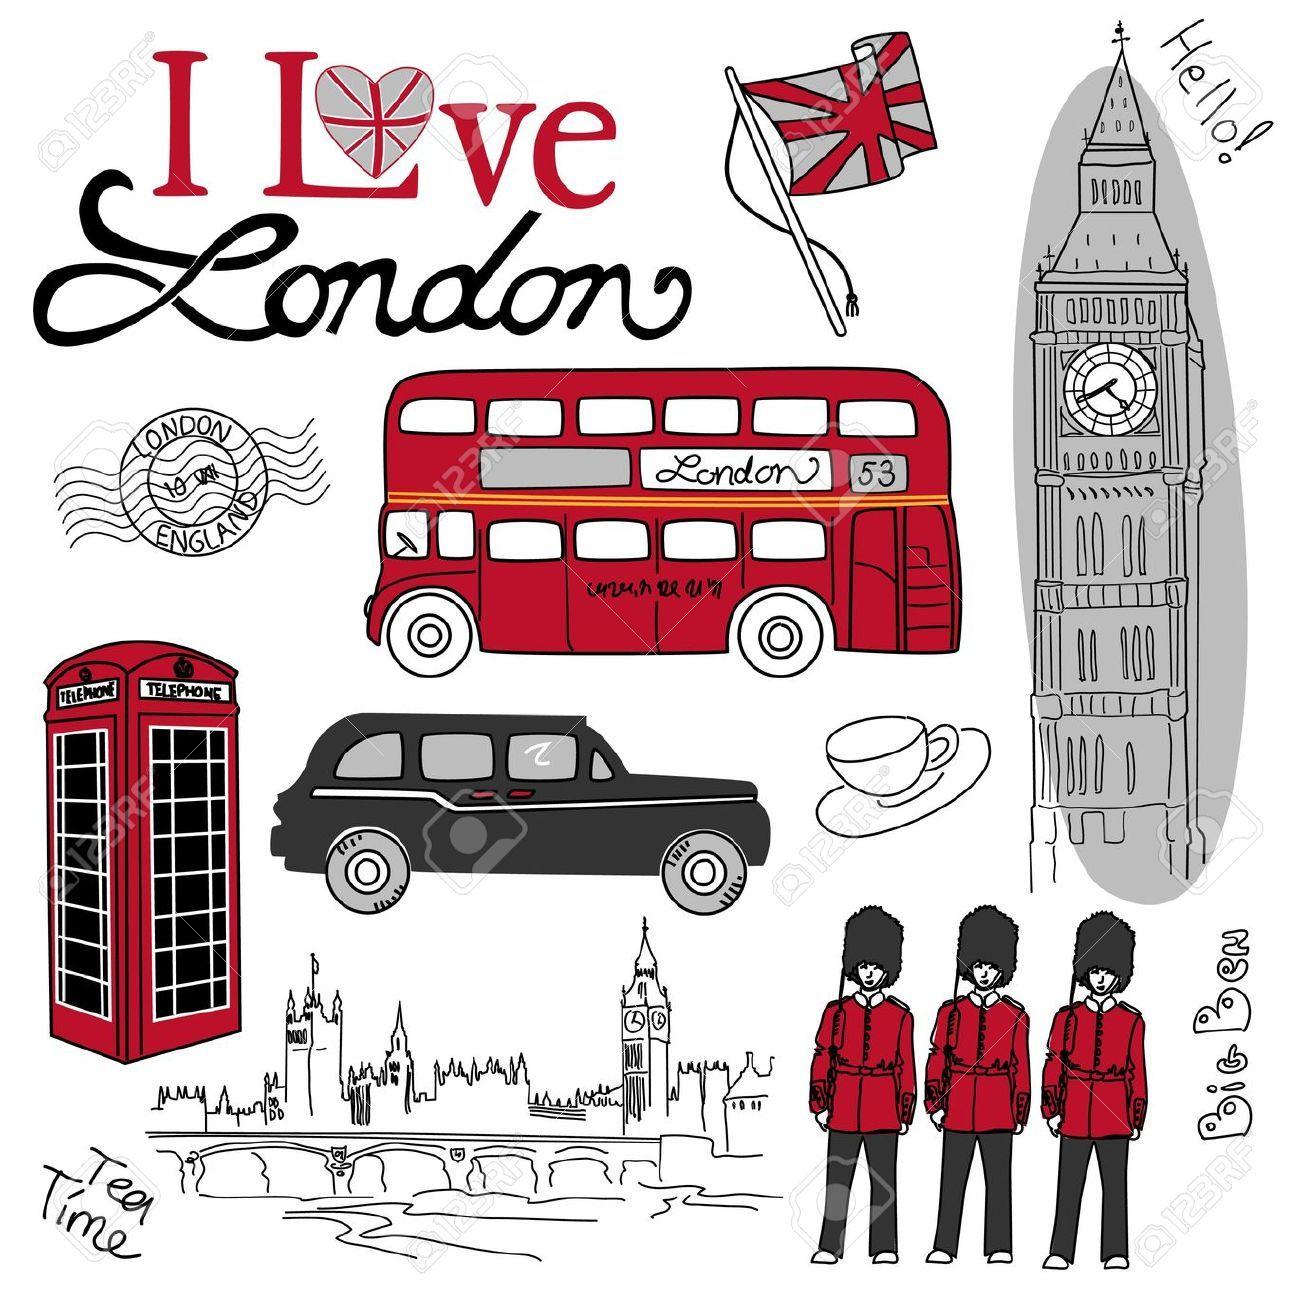 reloj de london dibujo - Buscar con Google | Mouton dessin, Illustrations, Carnets de voyage